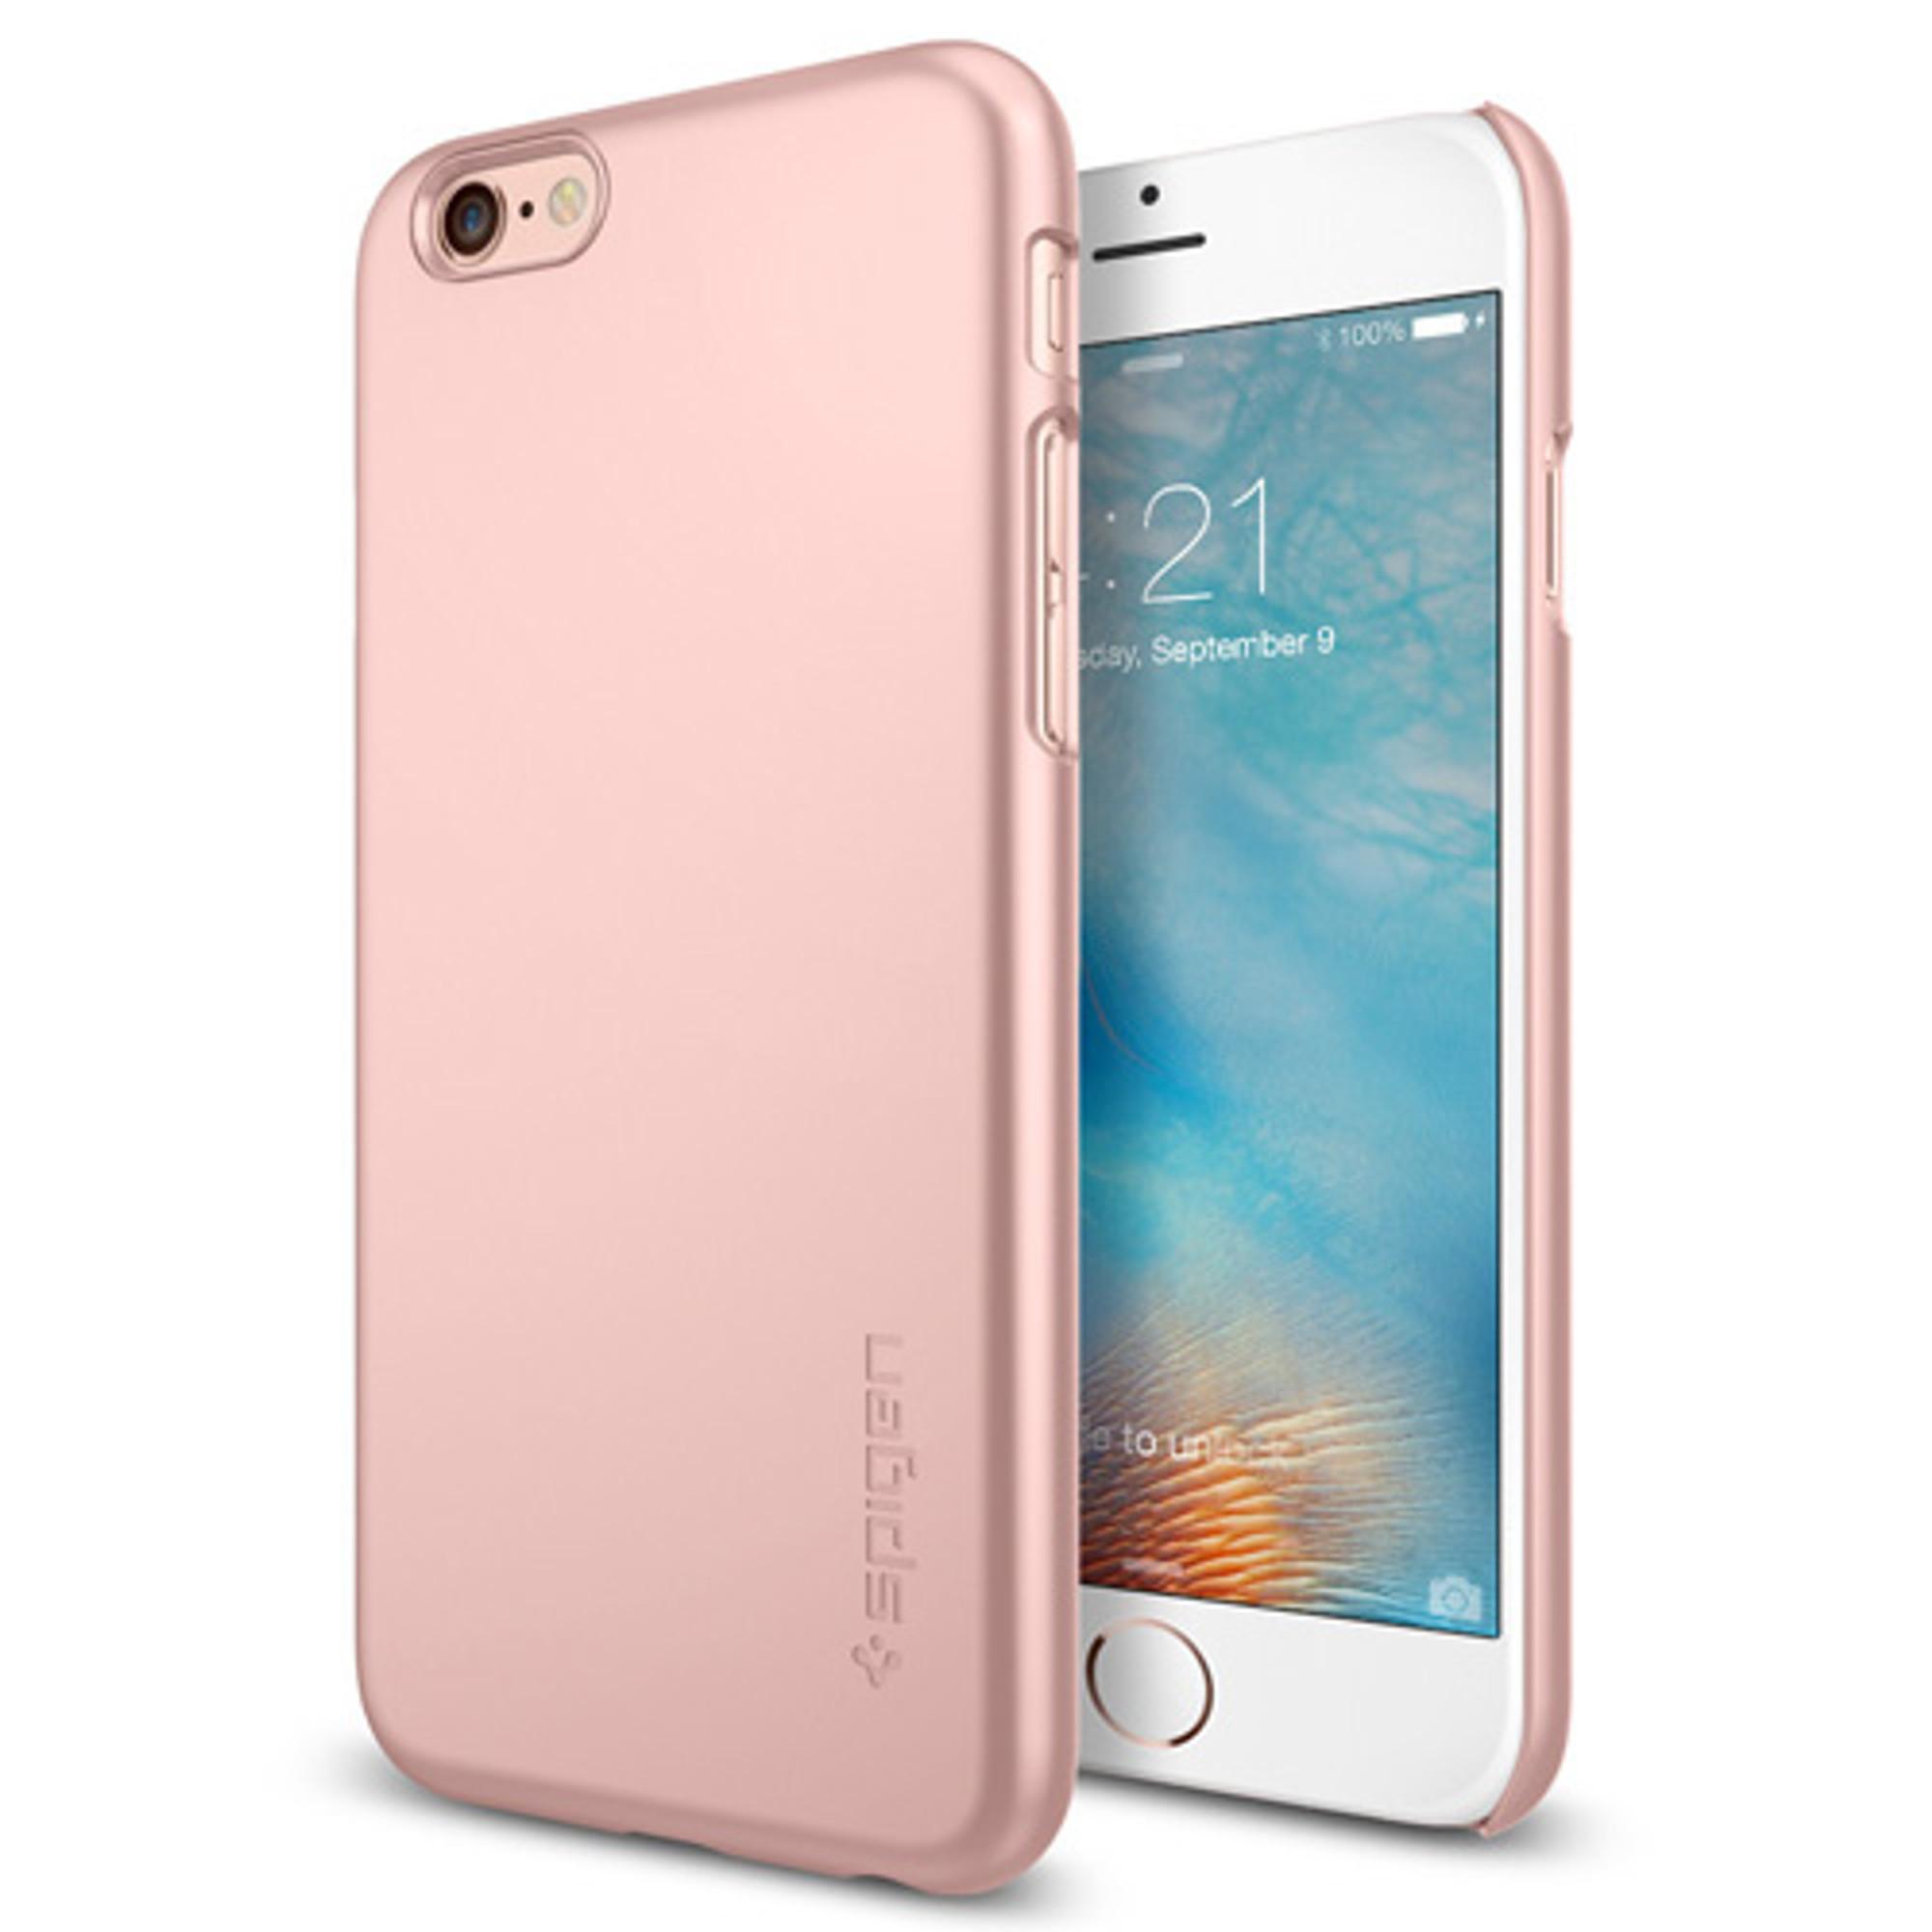 quality design b2b7f 35723 Spigen Thin Fit iPhone 6S / 6 Case - Rose Gold